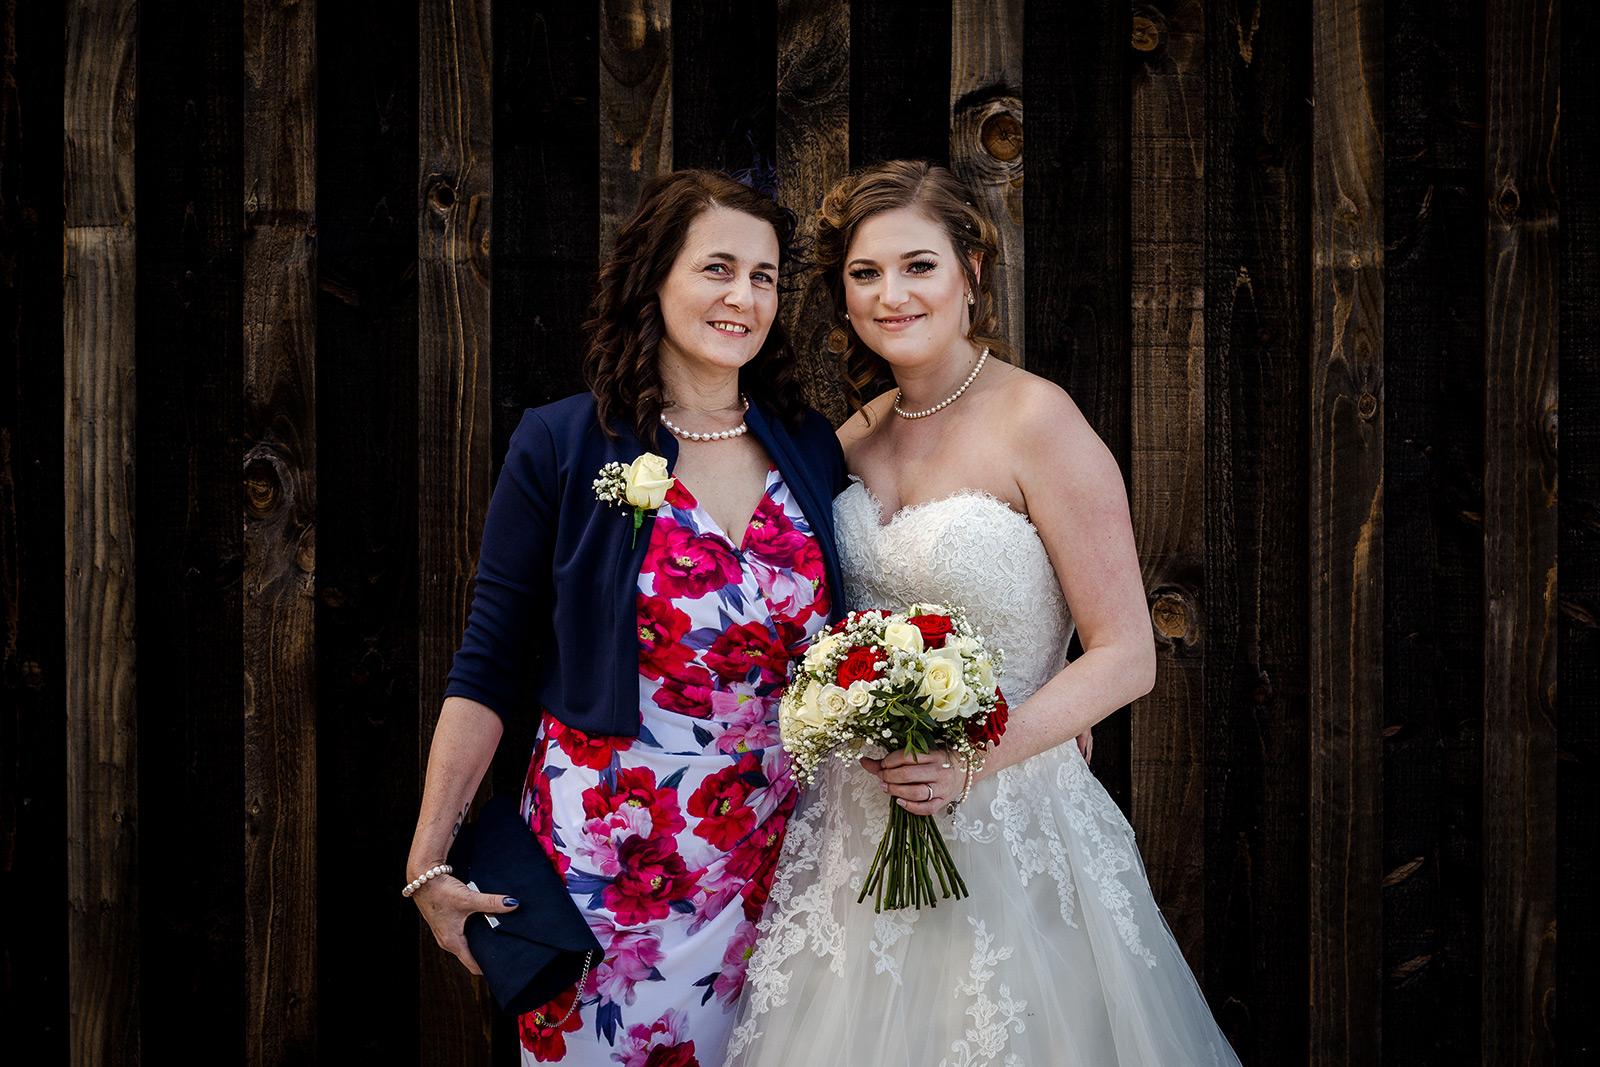 Mother of the bride at Hazel Gap Barn